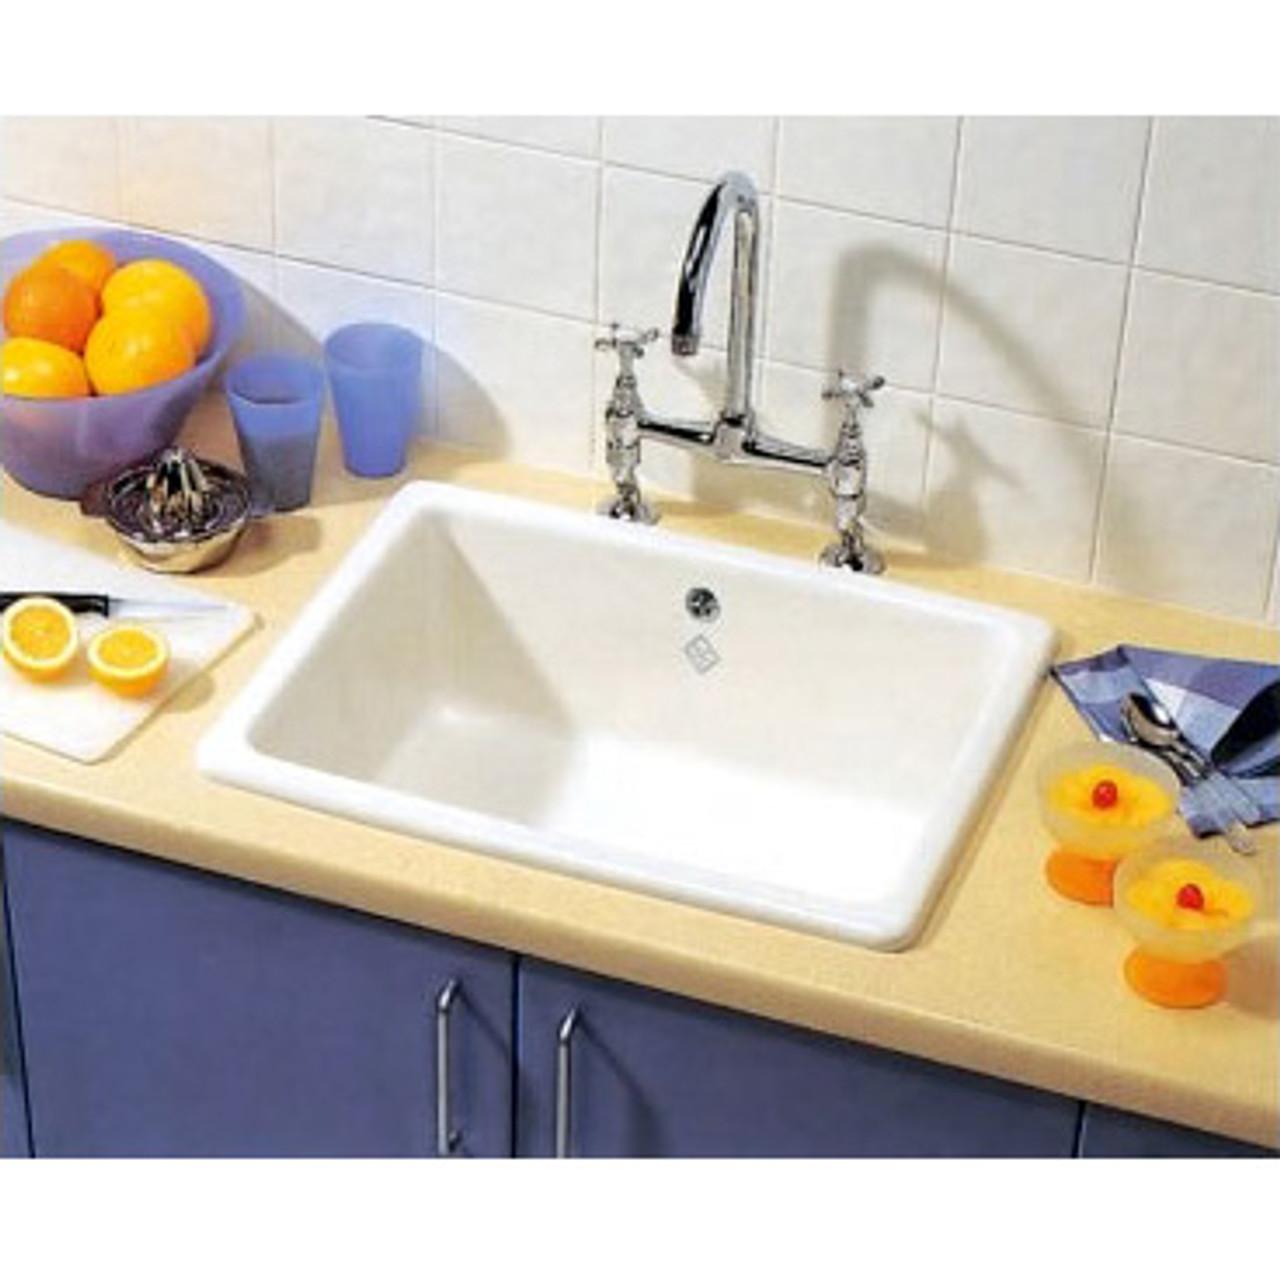 Shaws Classic Inset 800 Kitchen Sink - Cut Price Kitchens